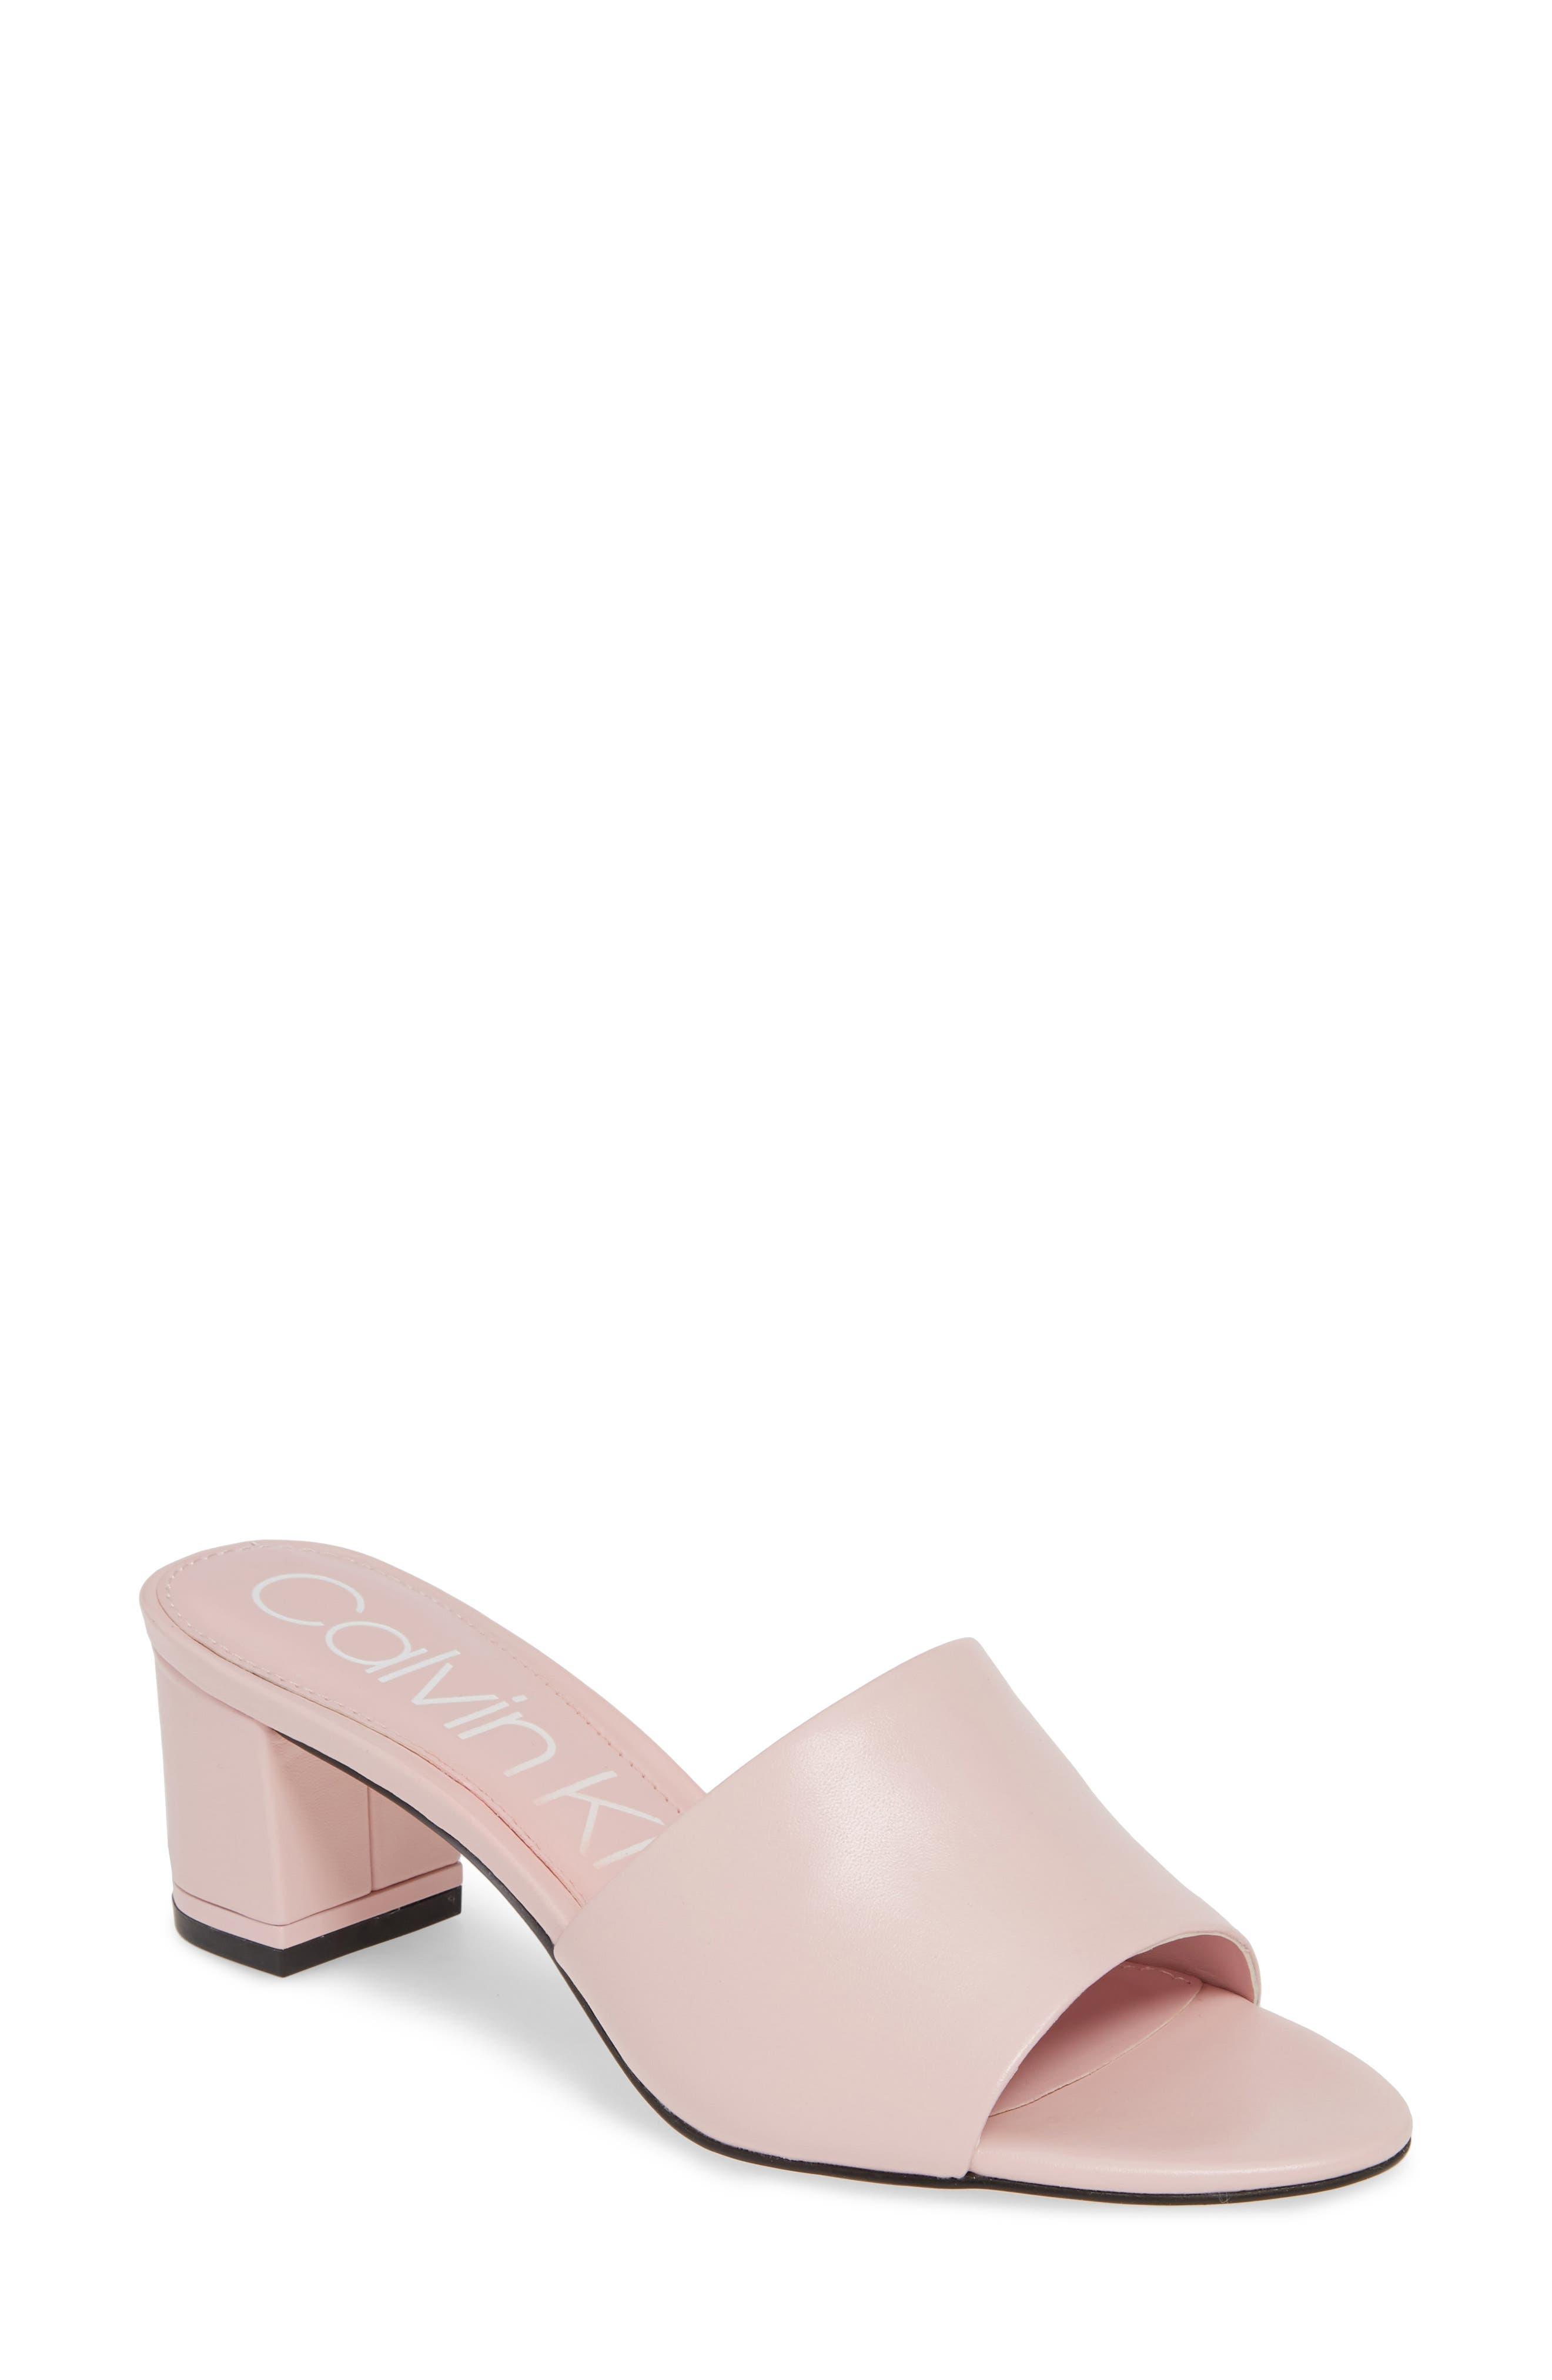 9f37e01fb59 Calvin Klein Block-Heel Sandals for Women